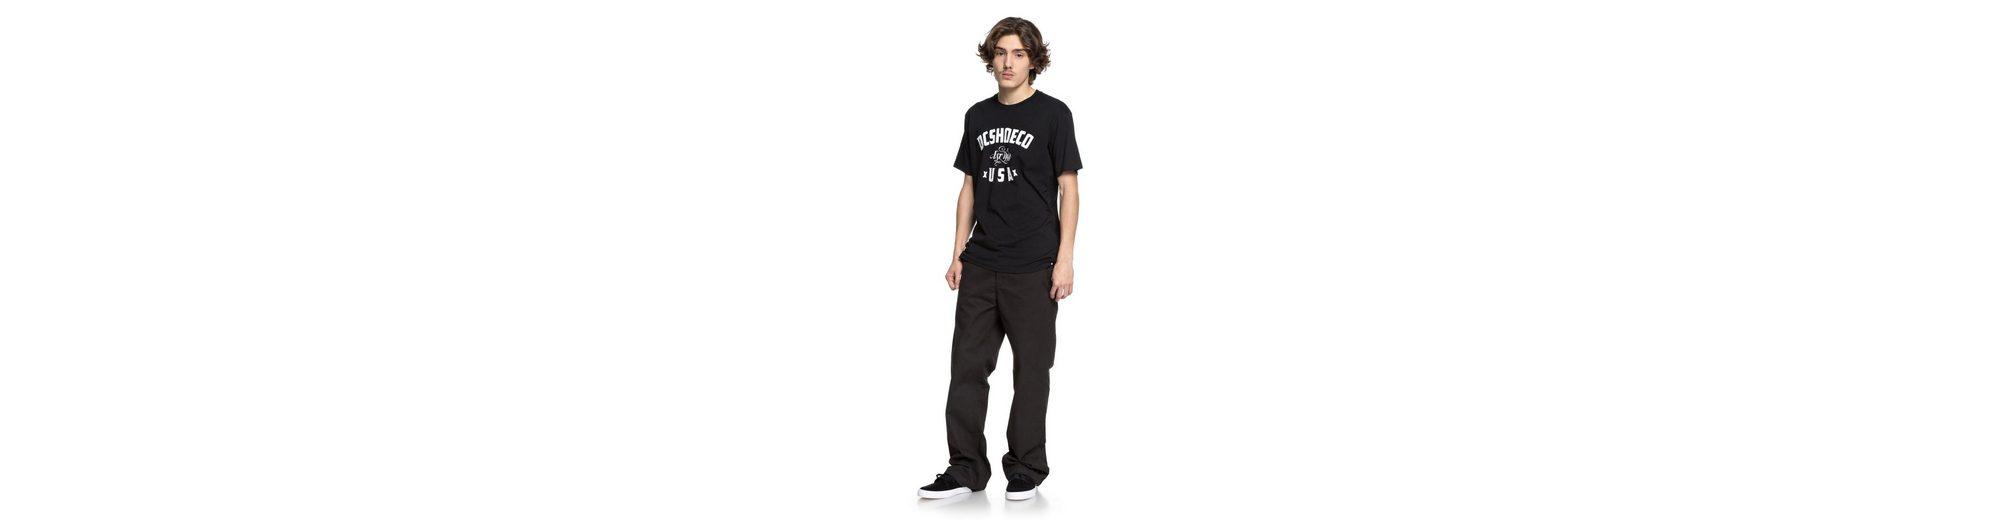 DC Shoes T-Shirt DC Fusty Mit Paypal Verkauf Online Manchester Günstiger Preis 0aJztwpdpX